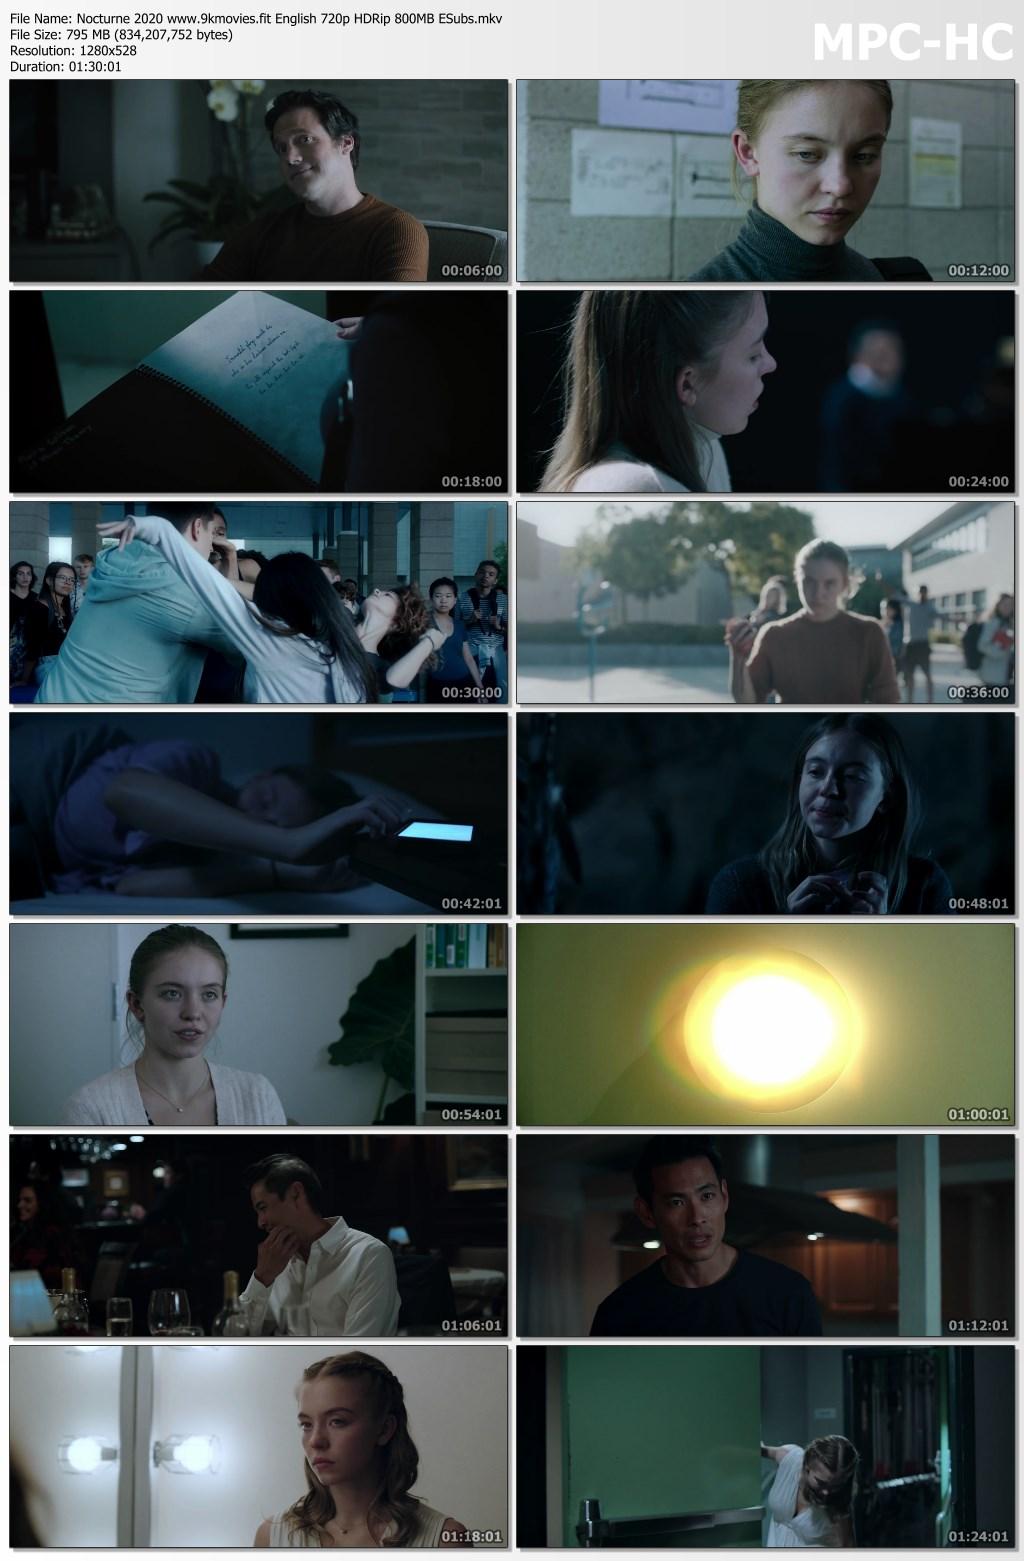 Nocturne 2020 screenshot HDMoviesFair